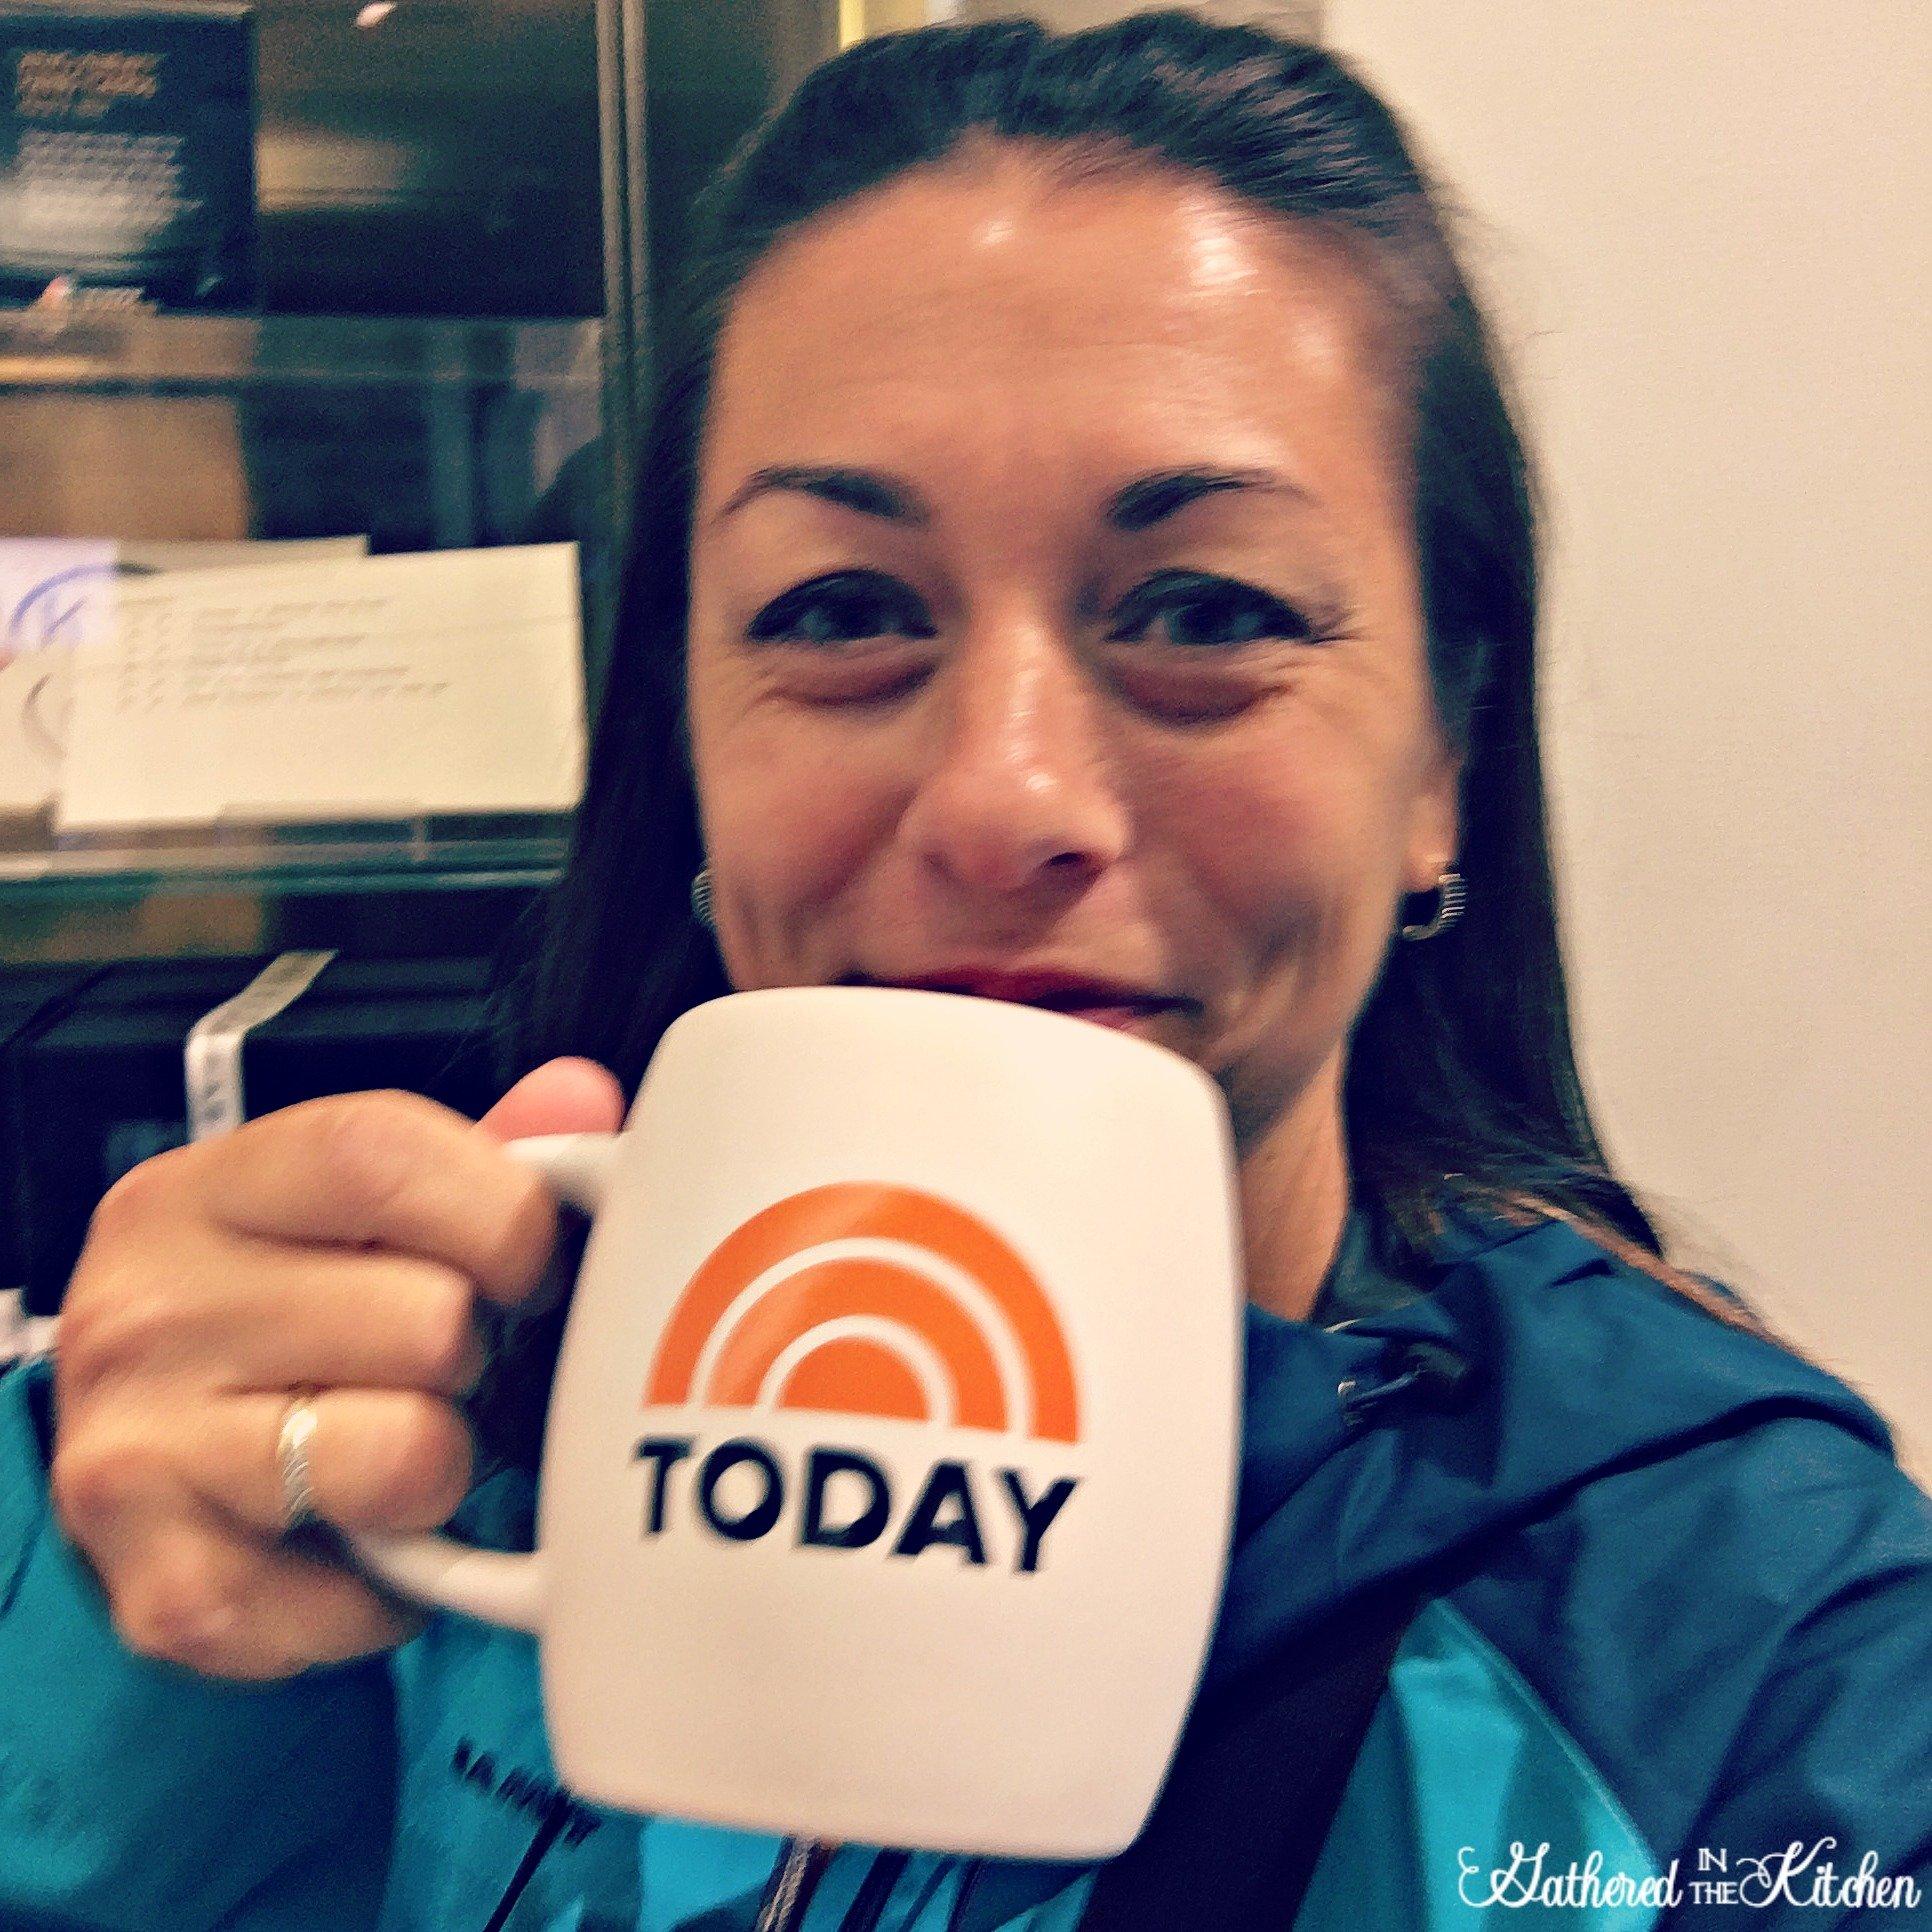 NBC Studios at Rockefeller Center NYC